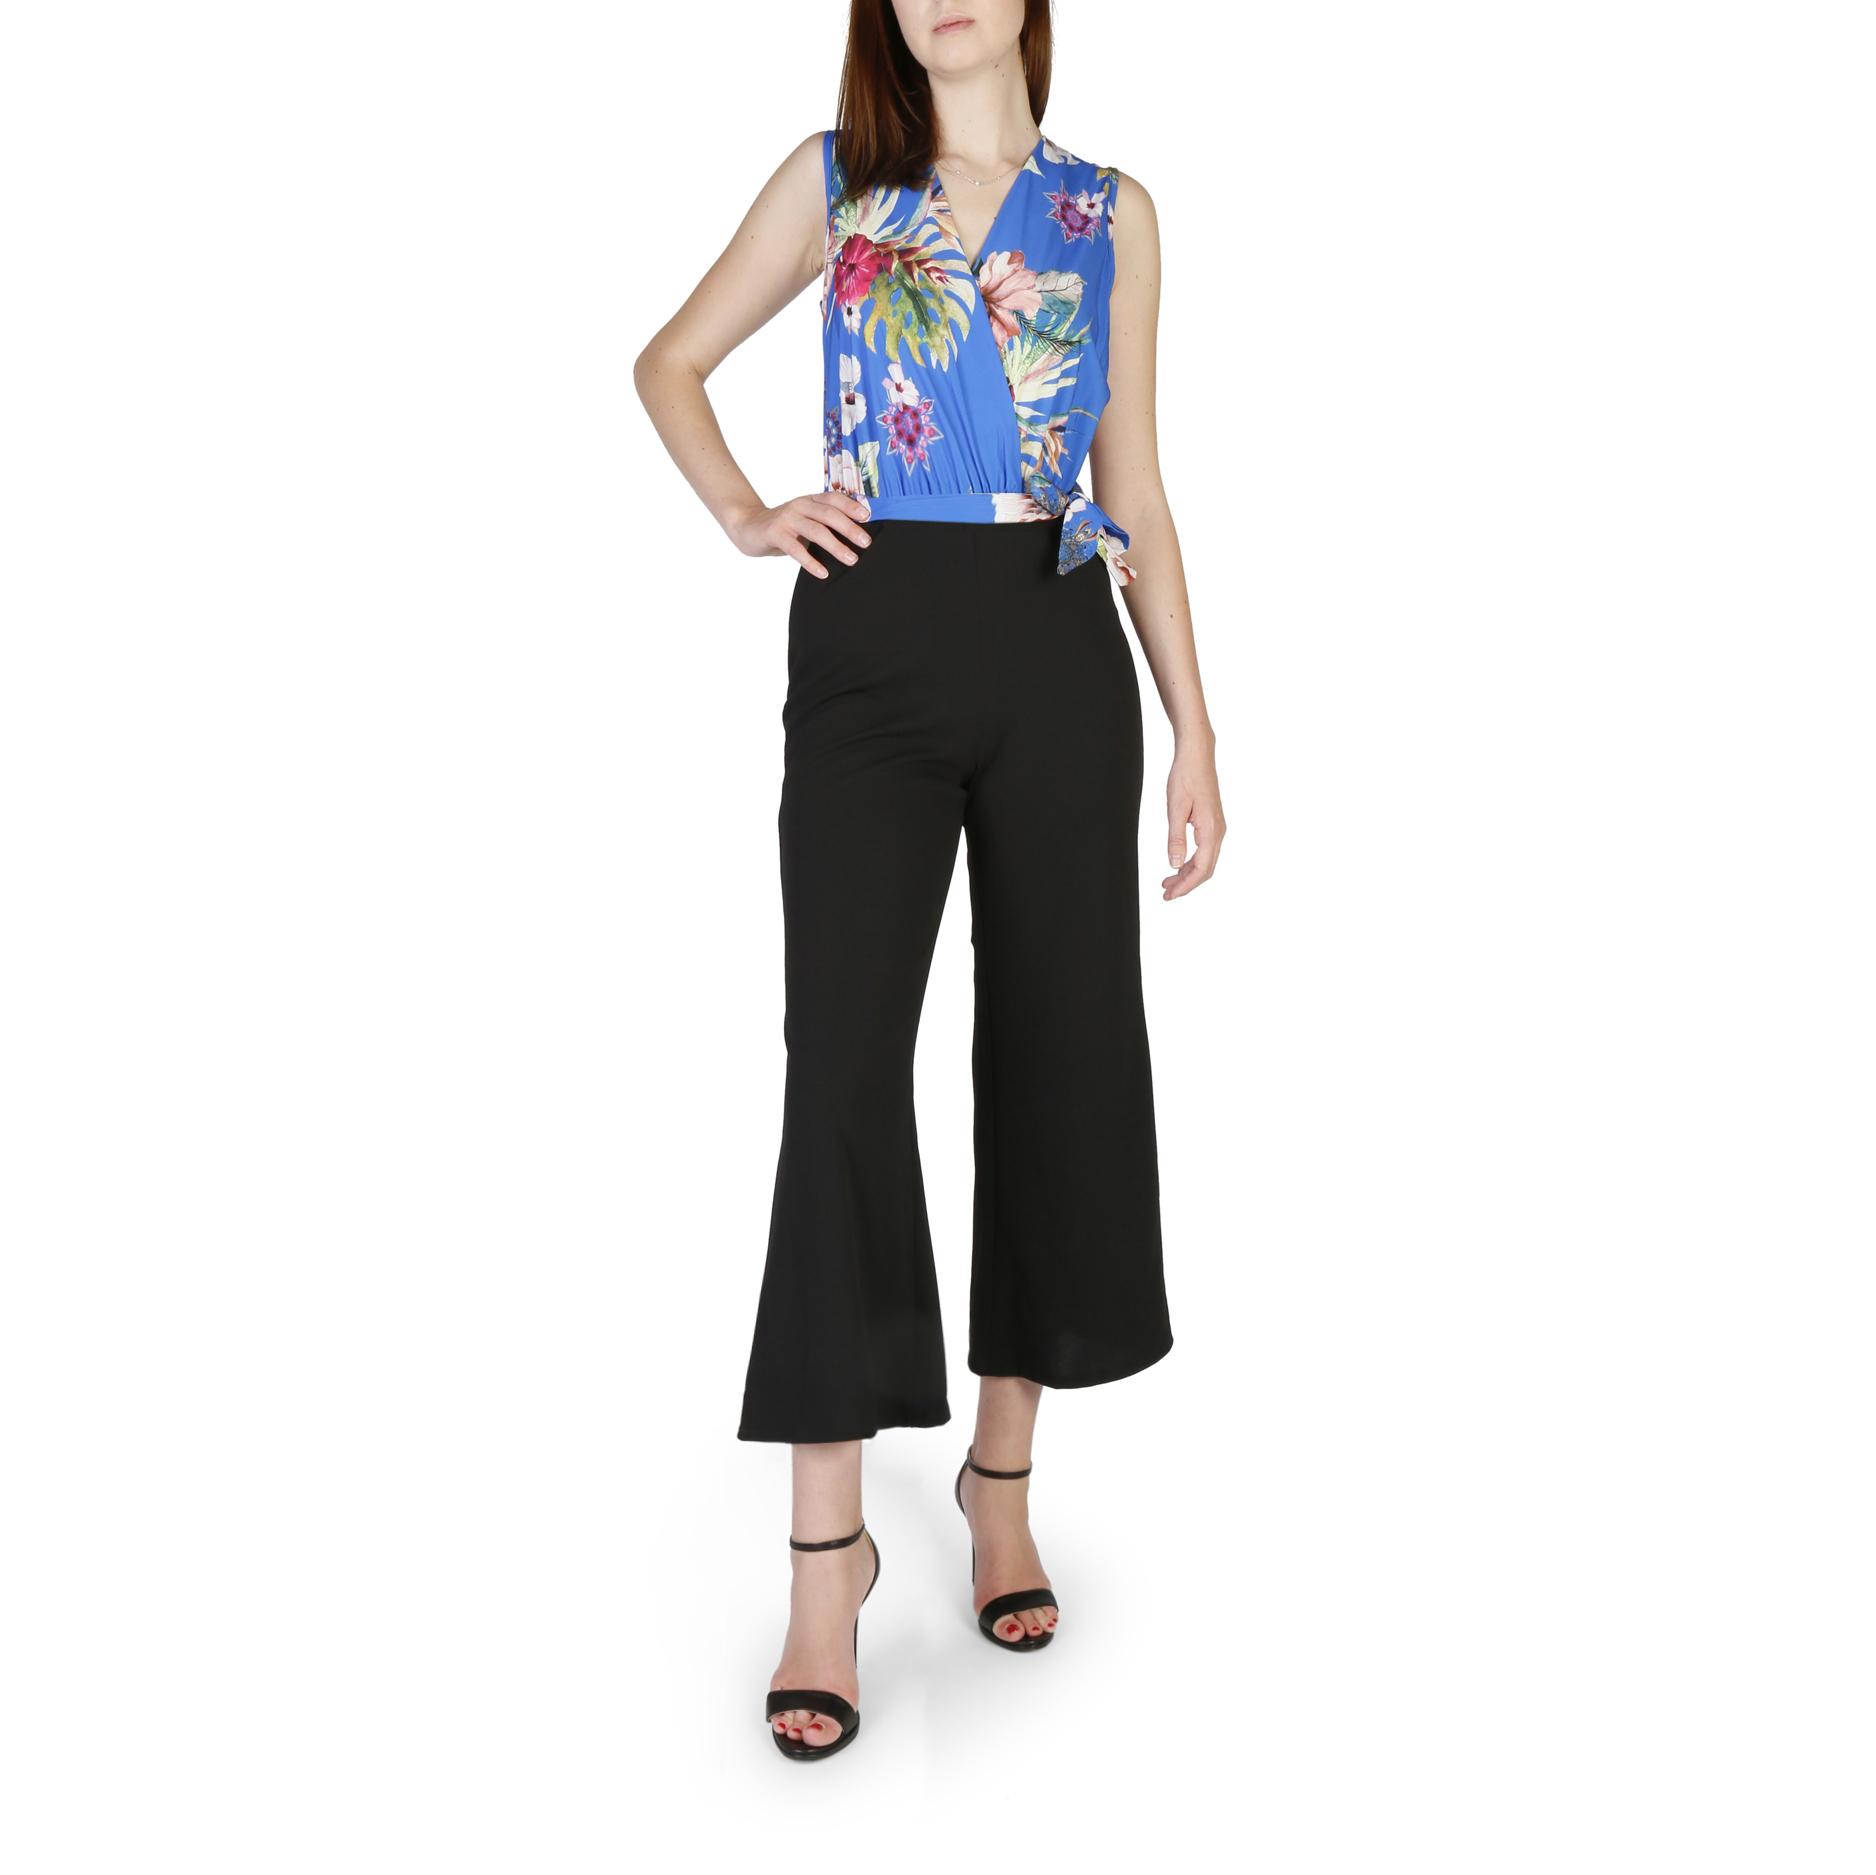 Overalls Damenbekleidung Großhandel Online Shop Fashion Korb